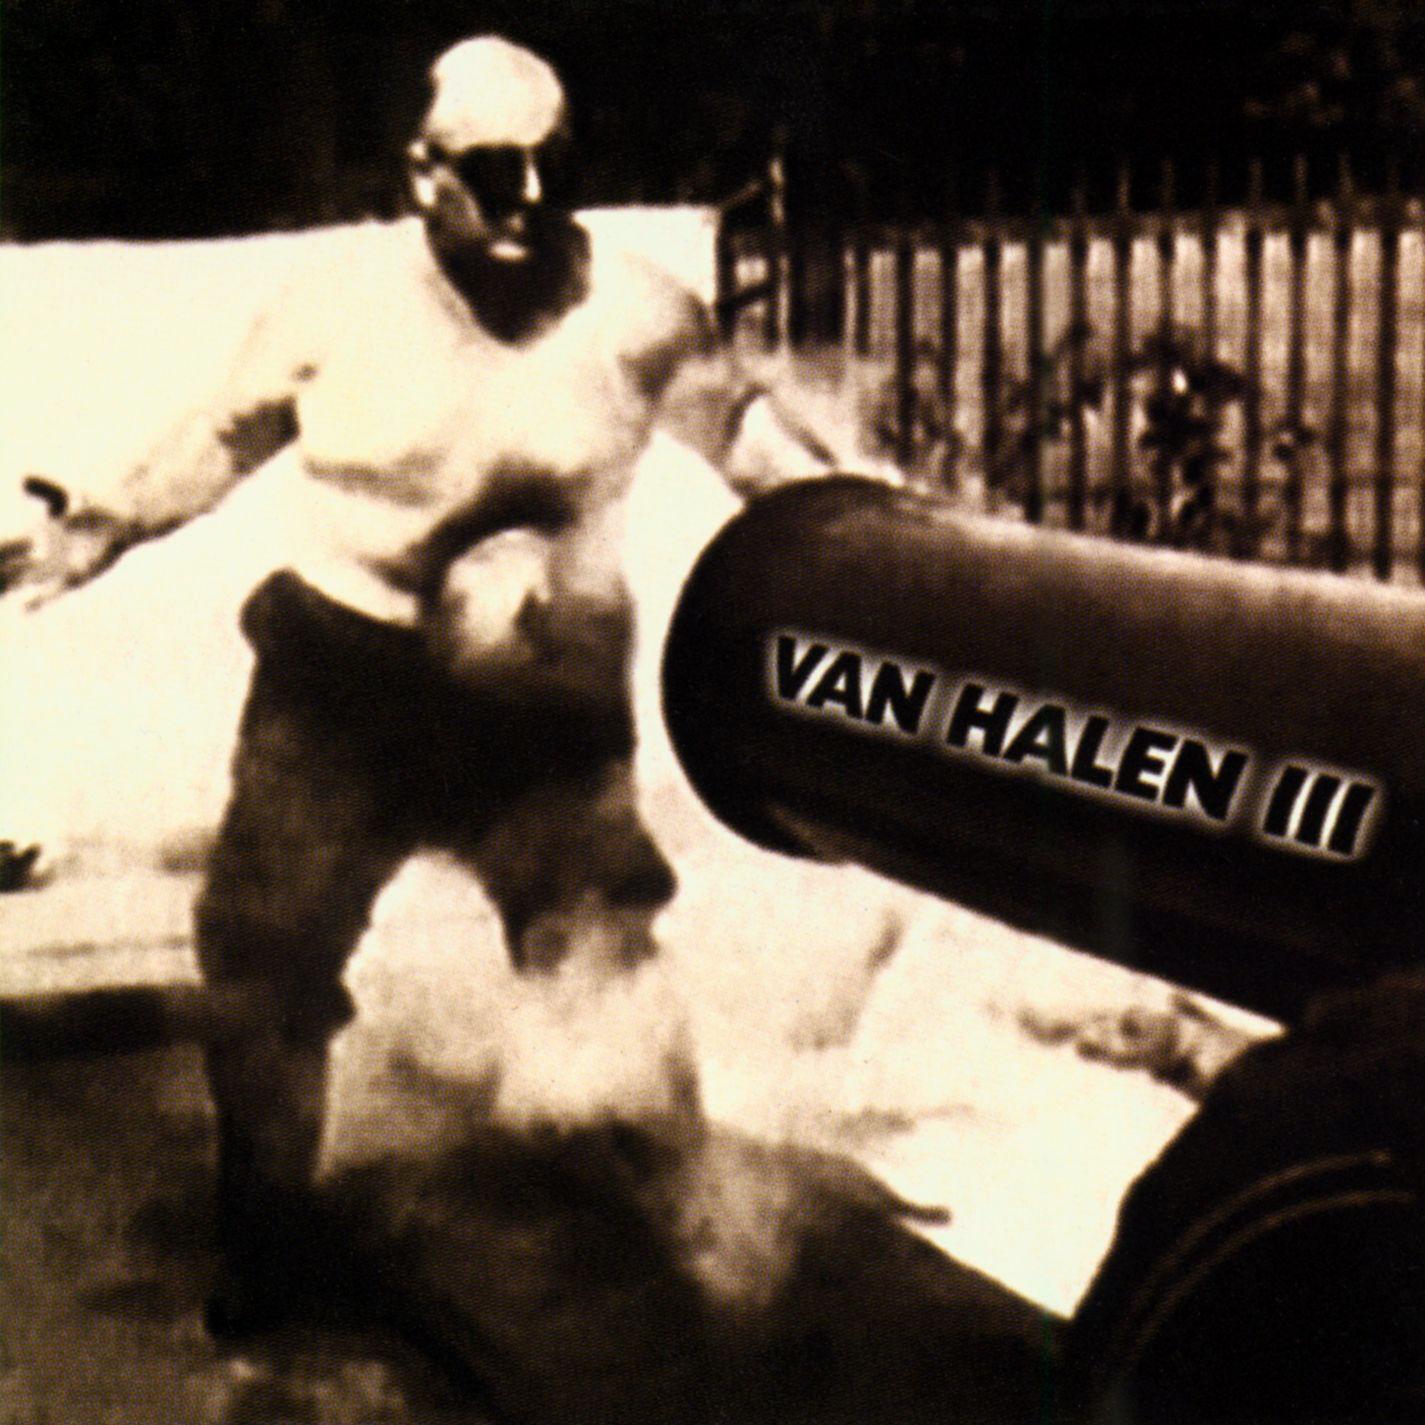 Van Halen (ヴァン・ヘイレン)11thアルバム『Van Halen III (ヴァン・ヘイレン3)』(1998年) 高画質ジャケット画像